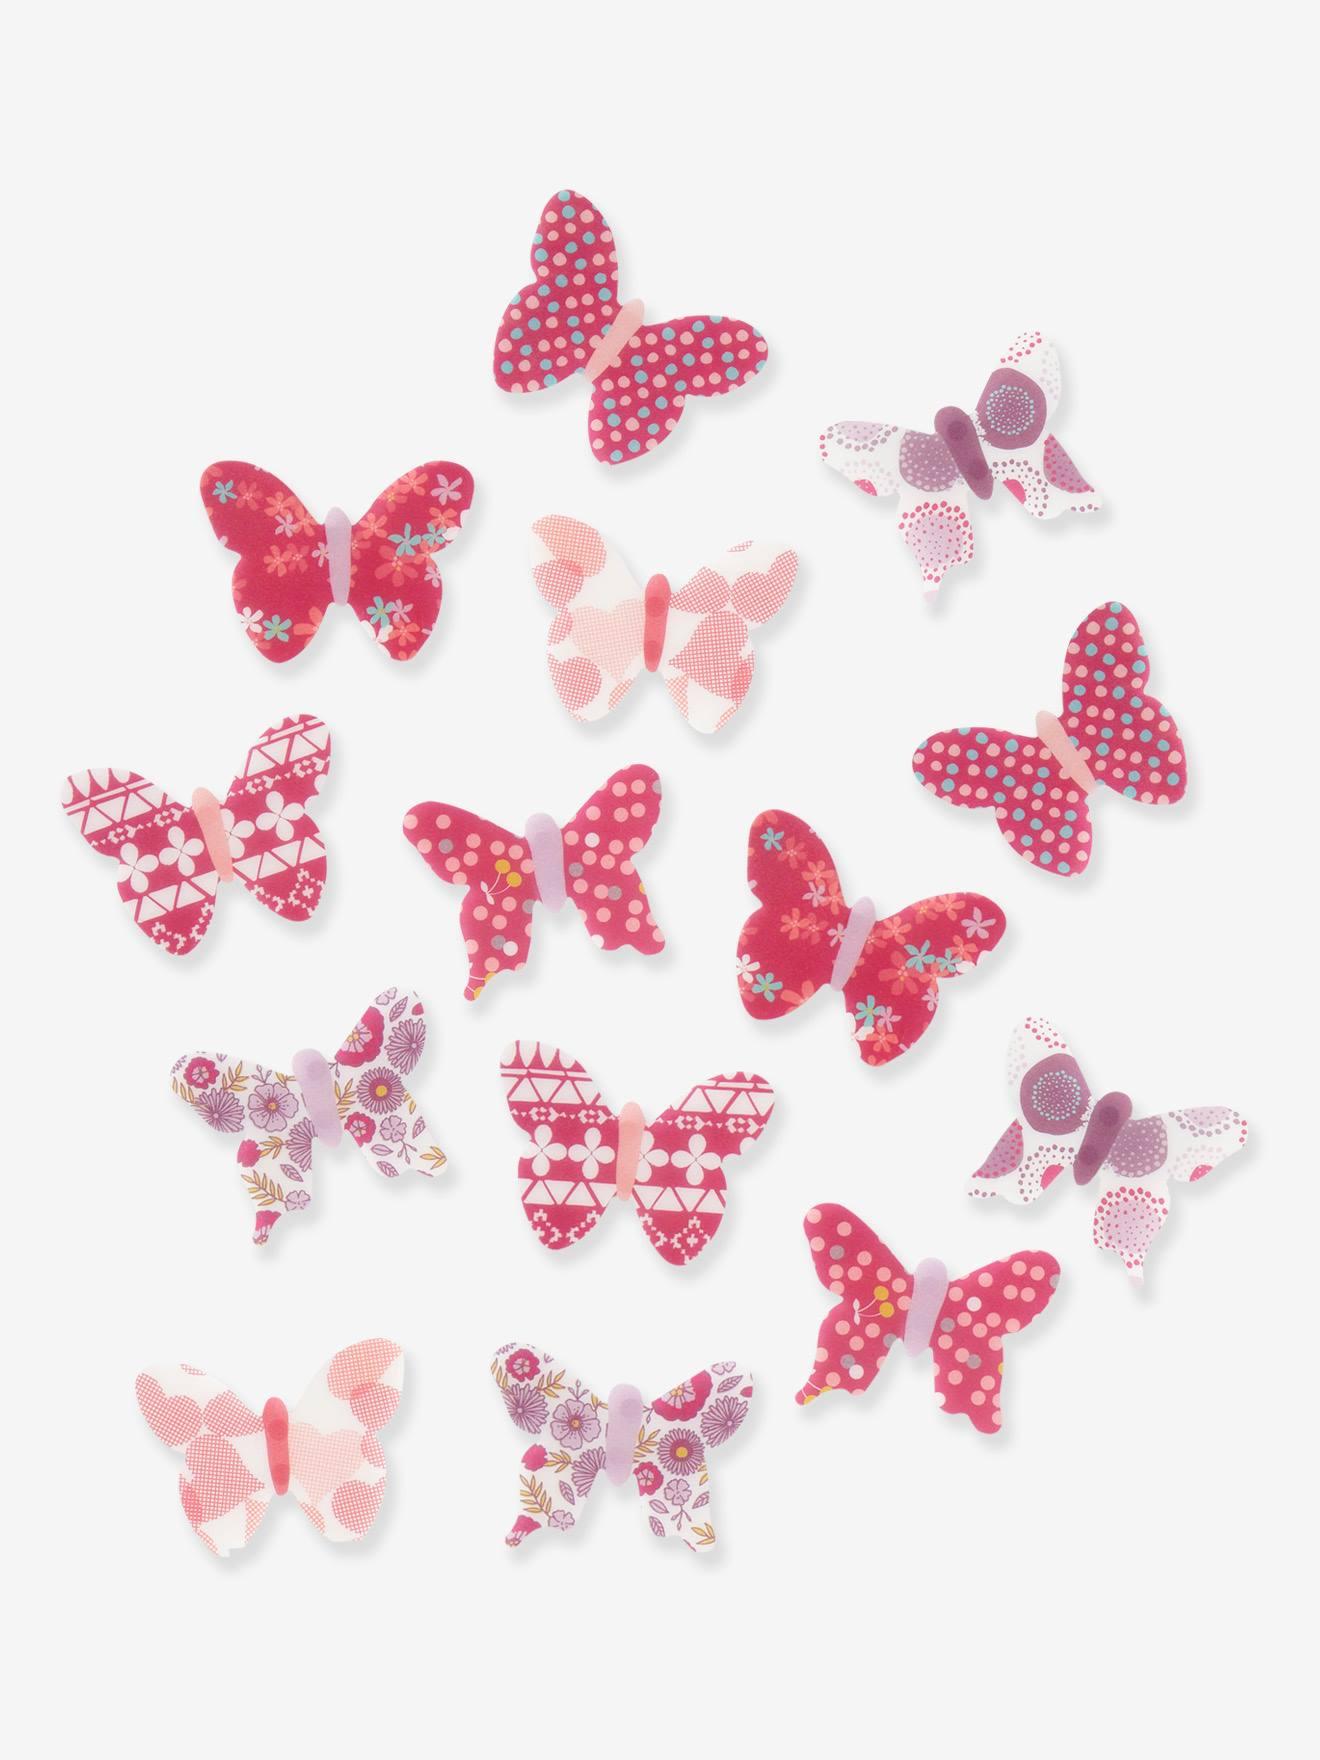 Lote de 14 decora es com borboletas para quarto de - Fotos decorativas ...